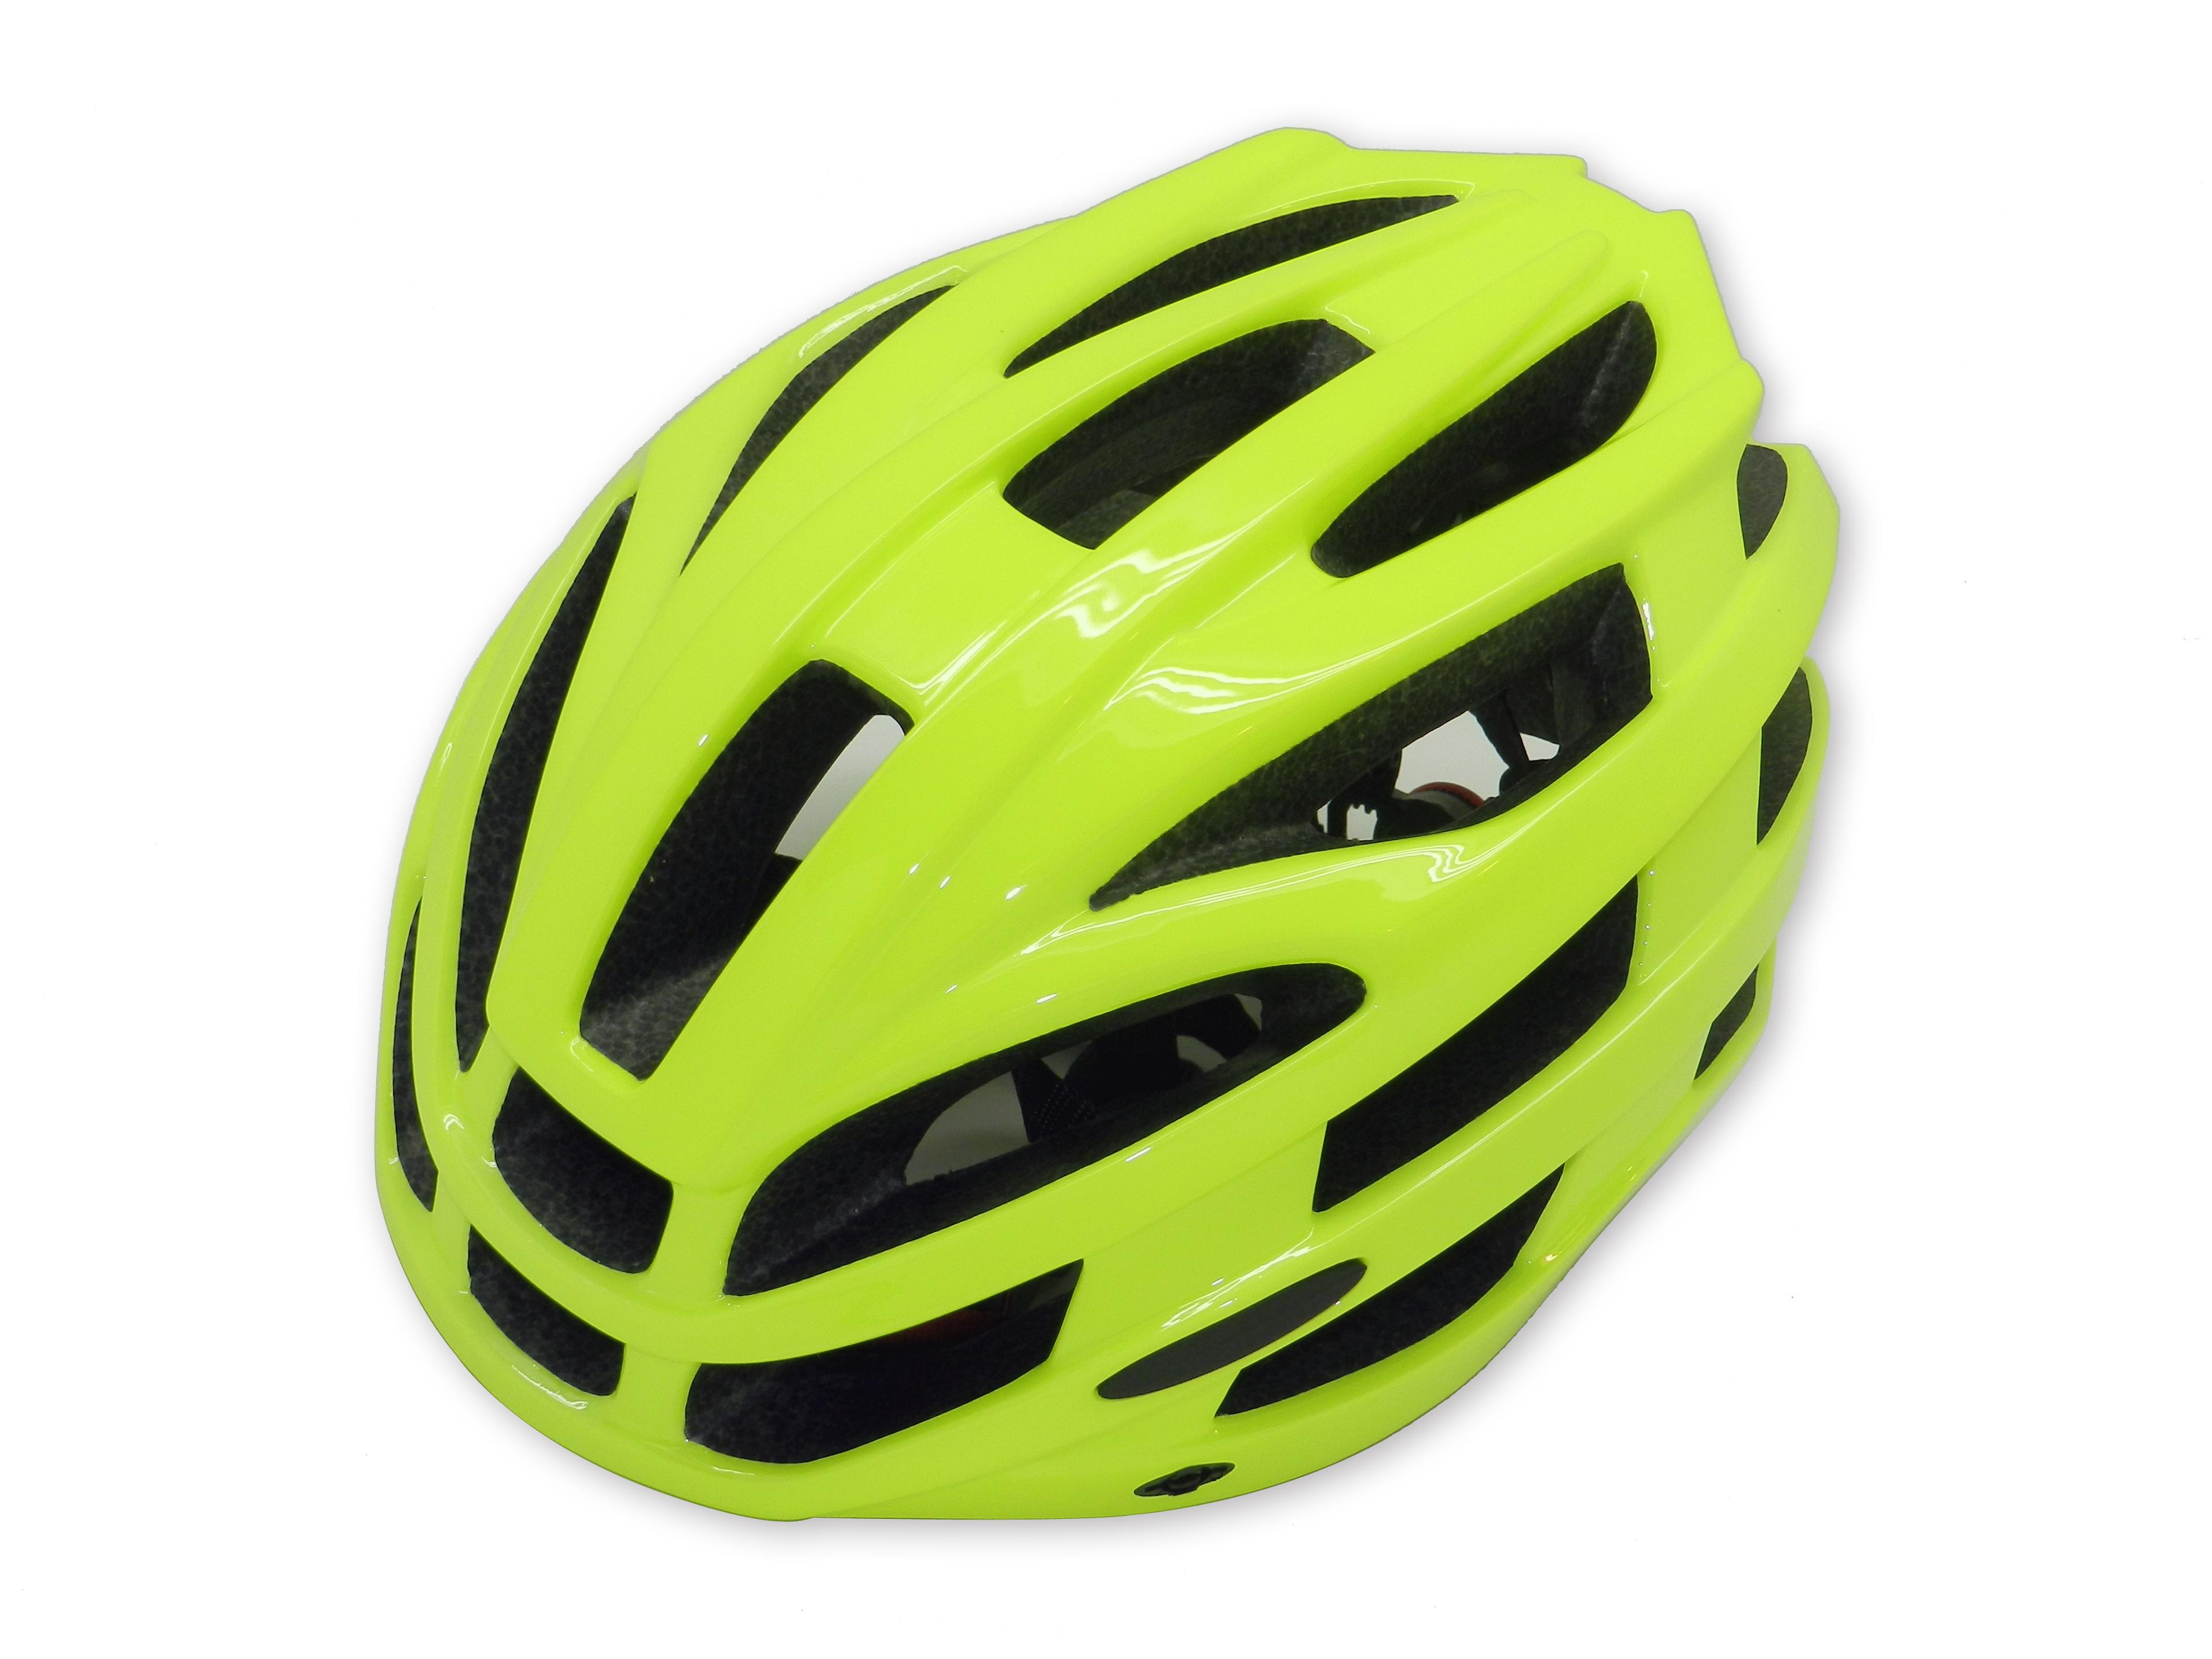 Adult high quality cycling ce certified bike helmet 3